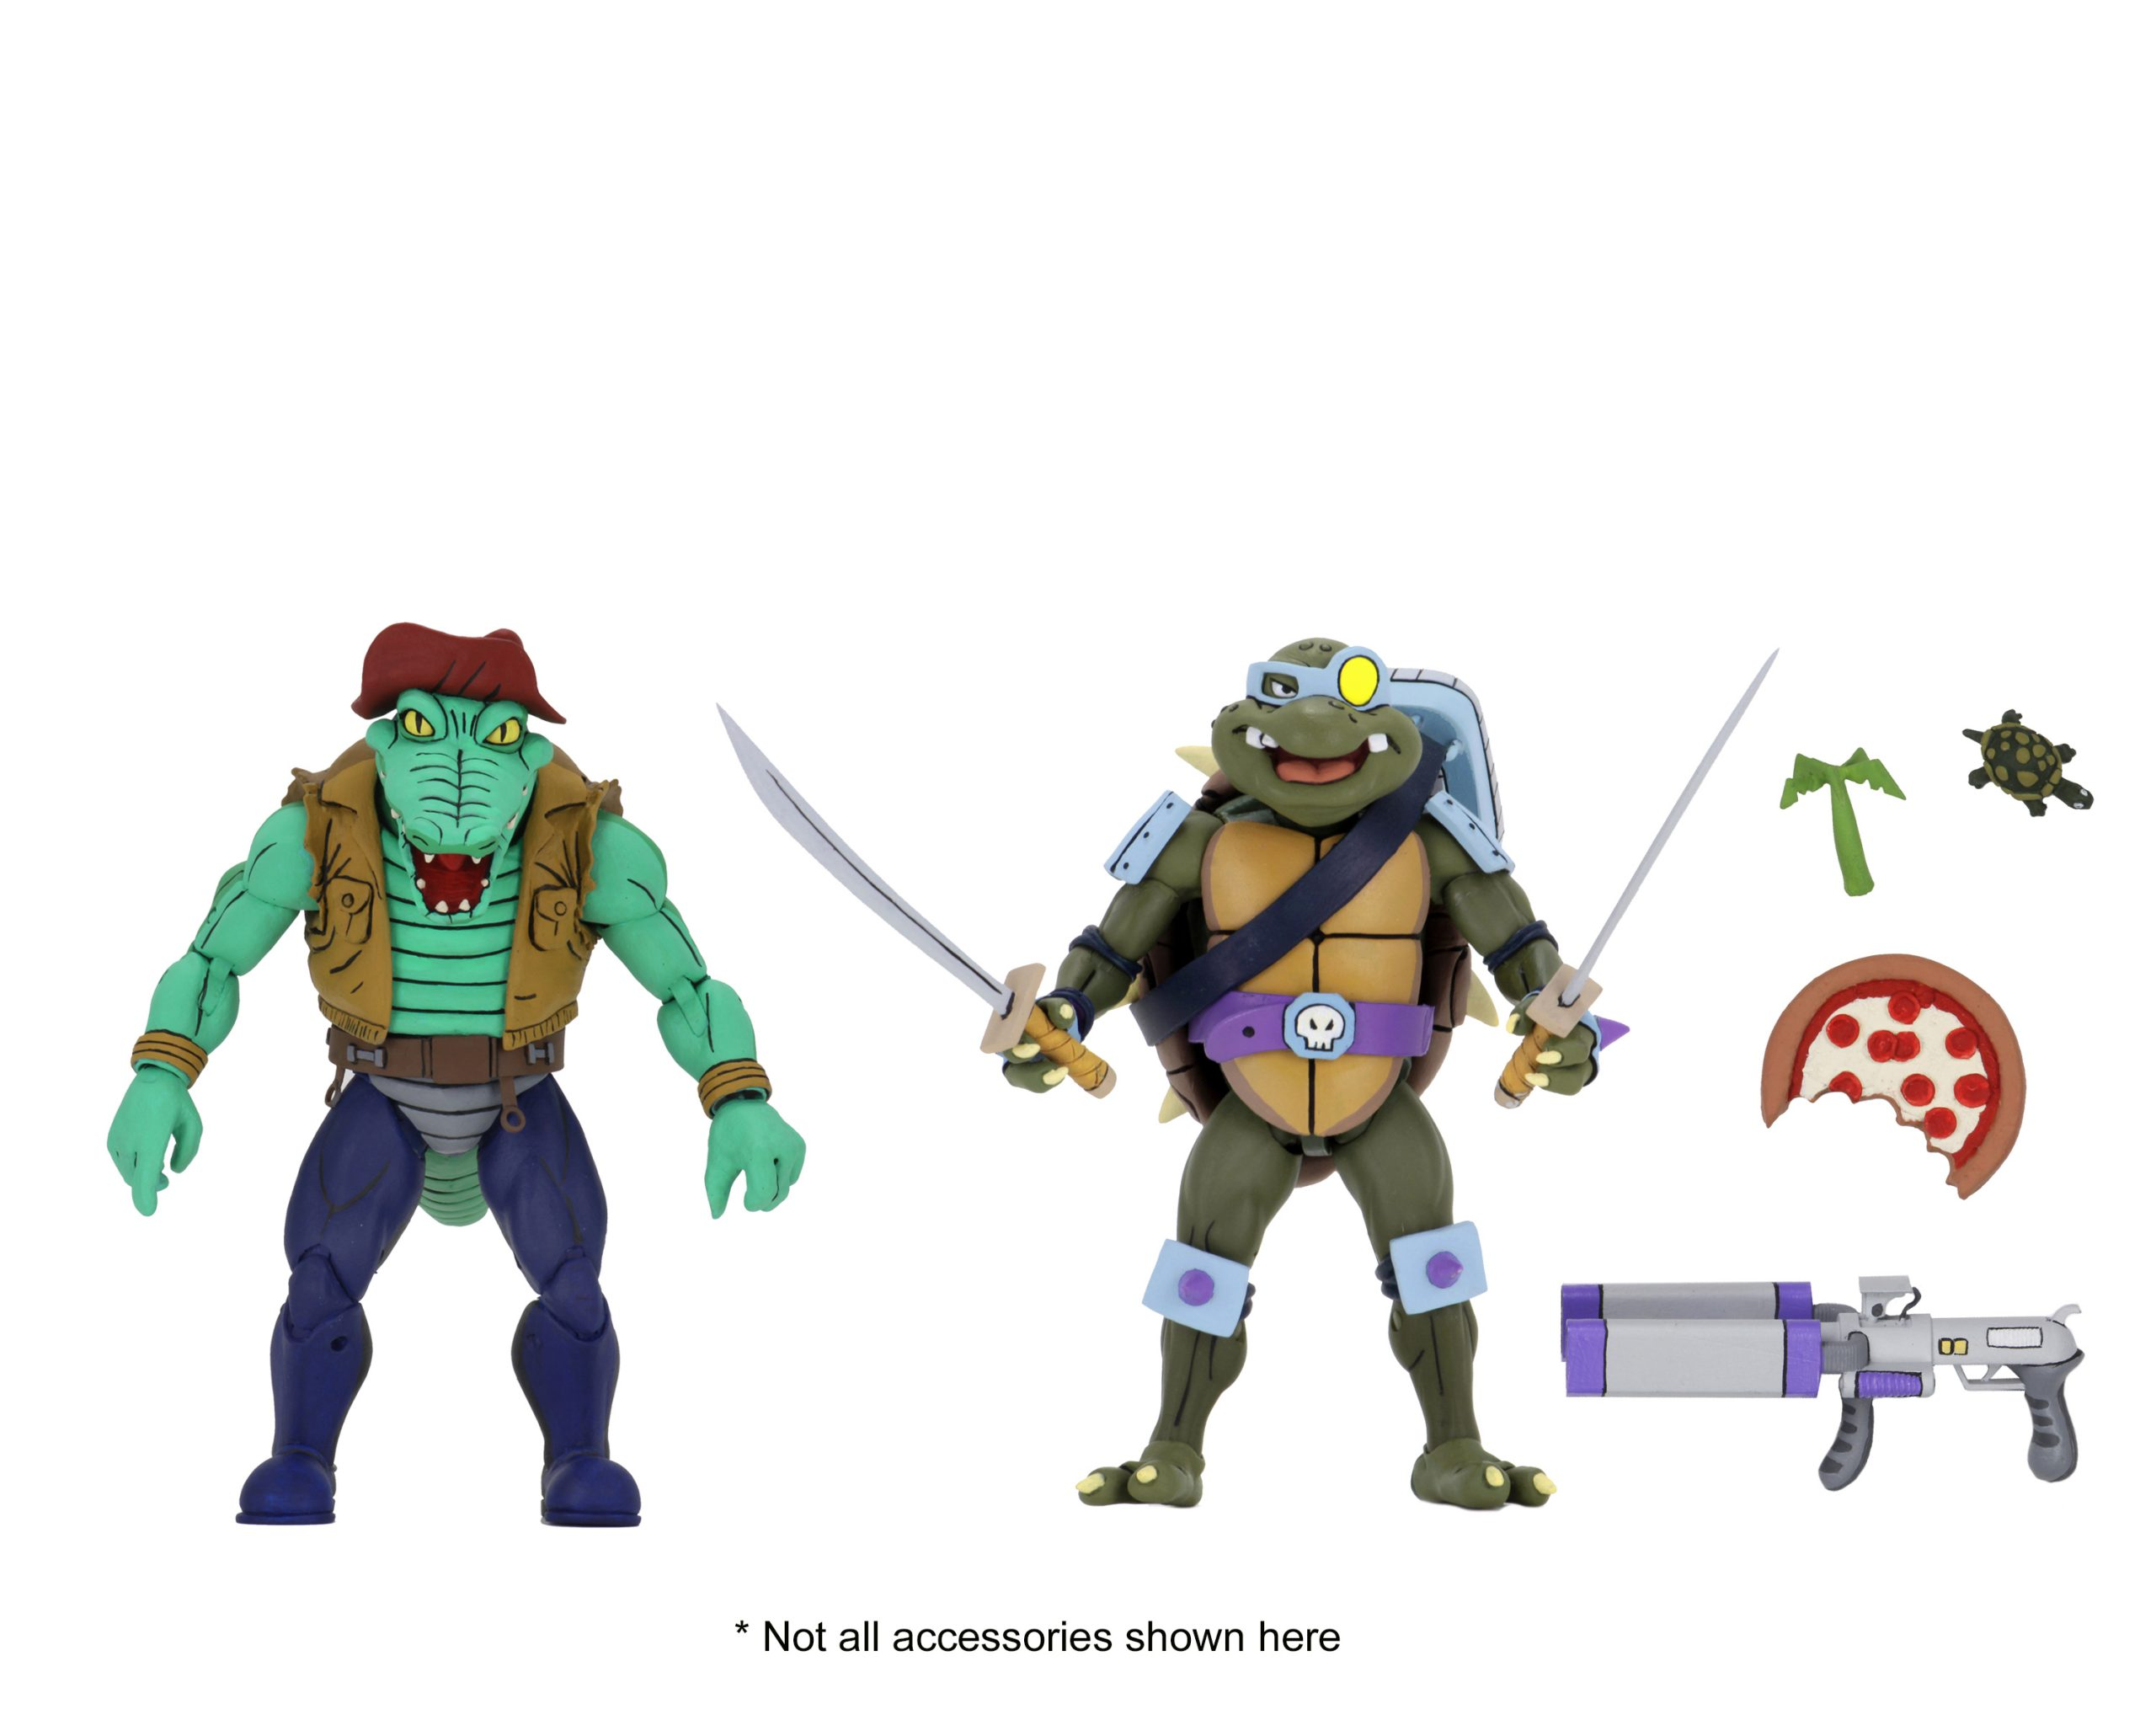 Neca Target Exclusive Tmnt Series 3 Cartoon 2 Packs Official Line